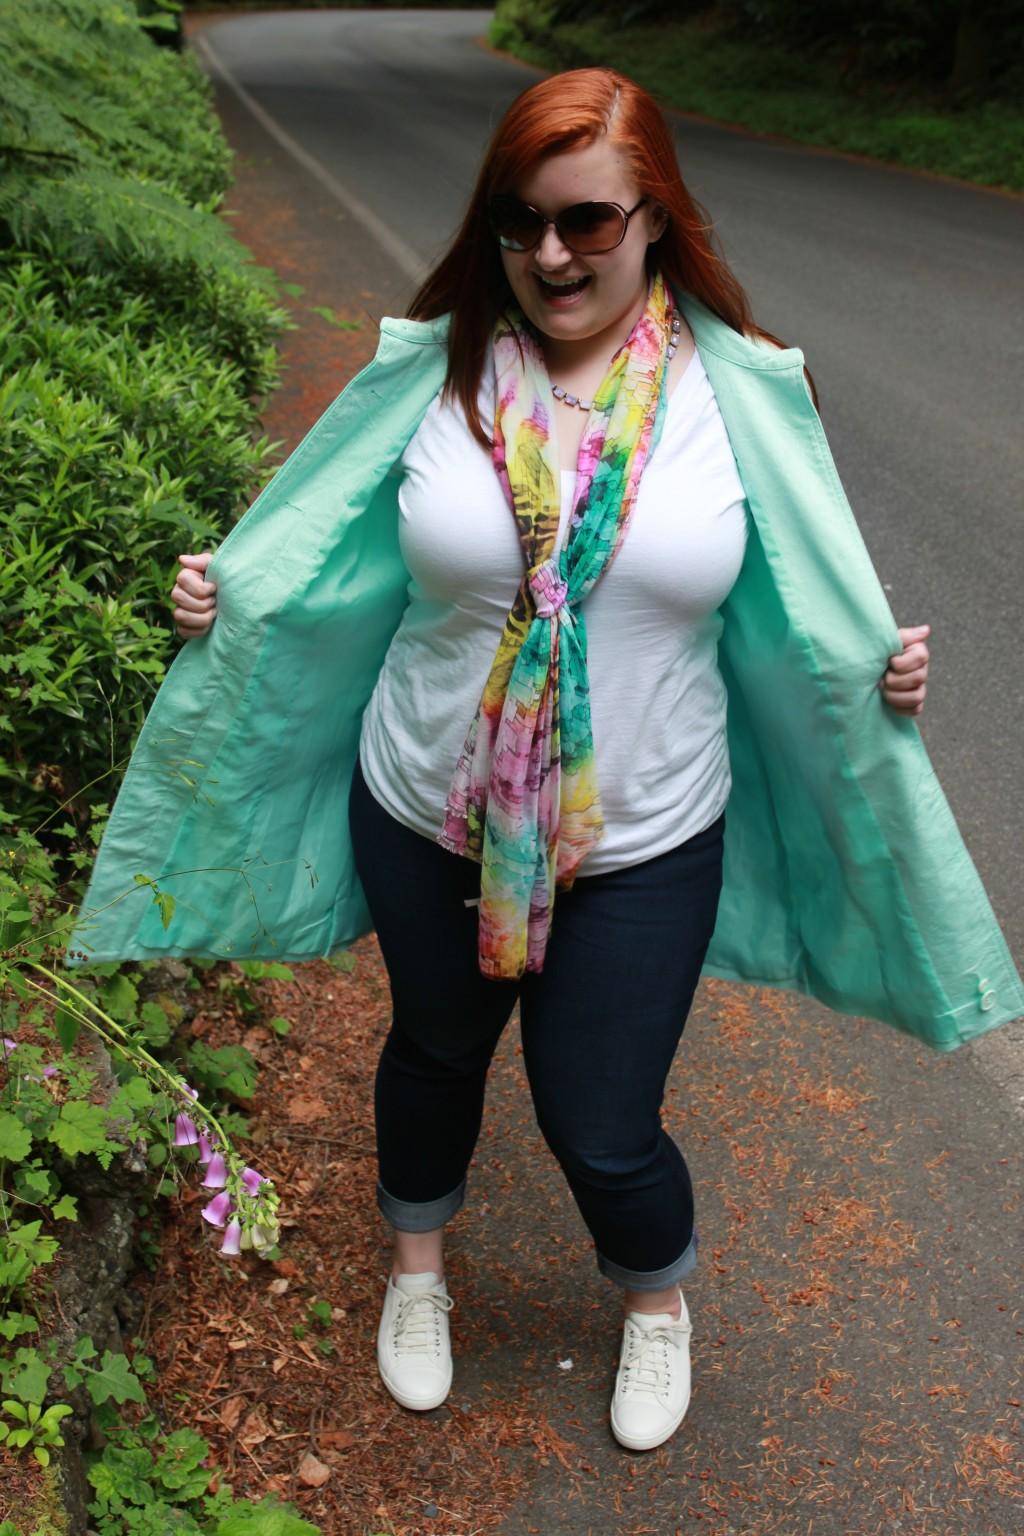 Fashion Blogger outtakes